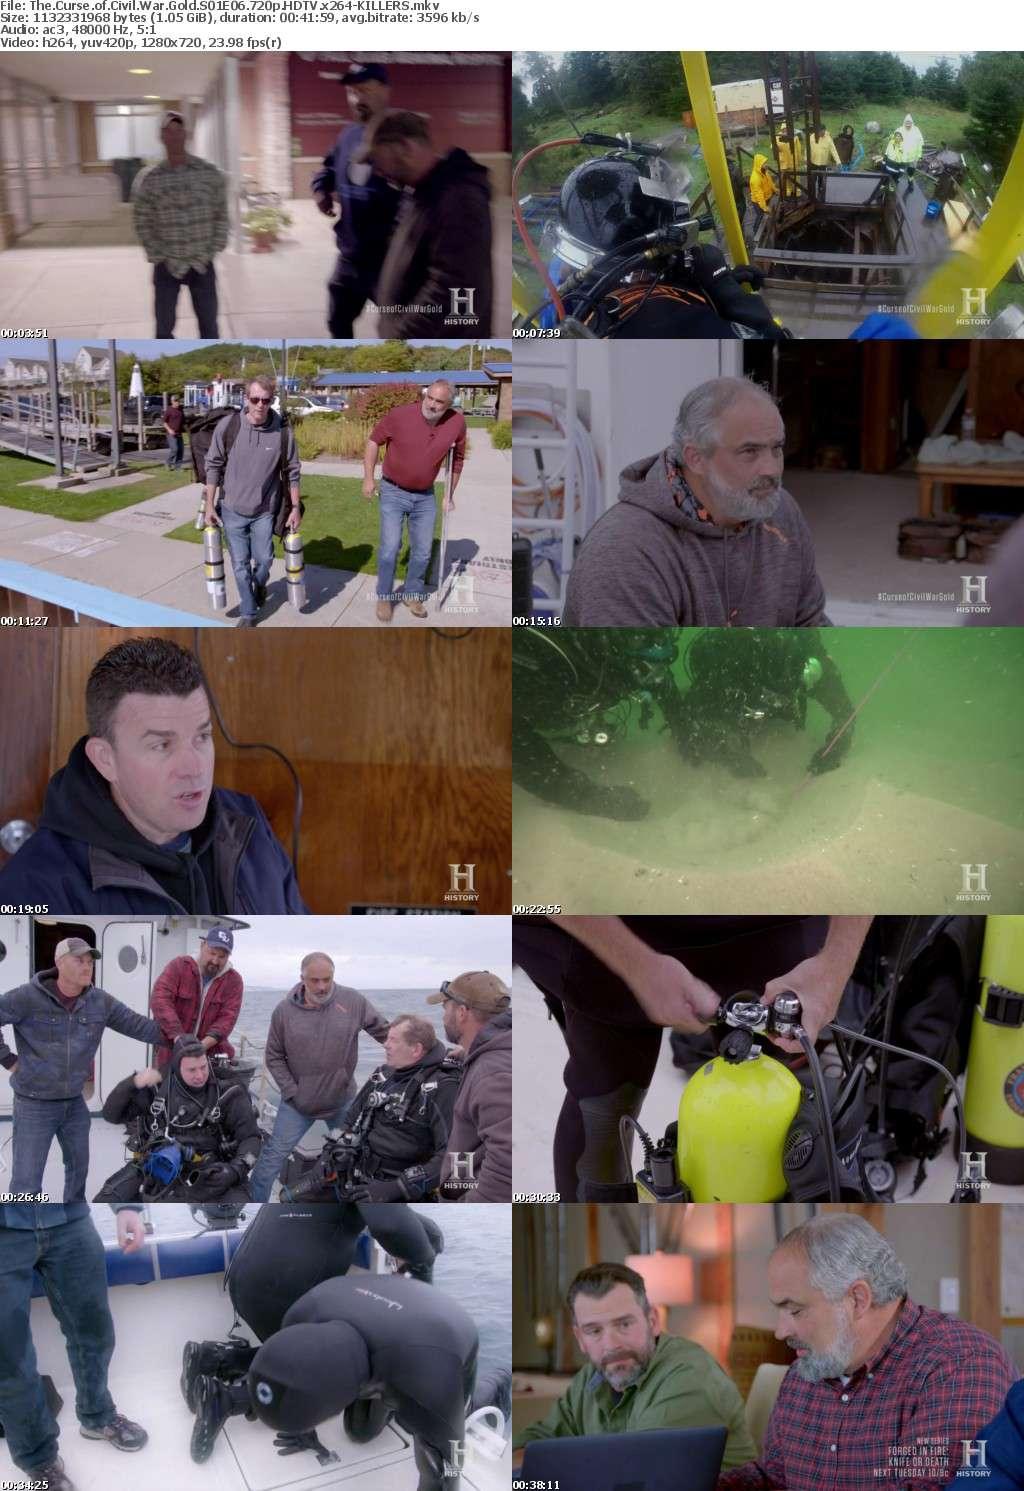 The Curse of Civil War Gold S01E06 720p HDTV x264-KILLERS